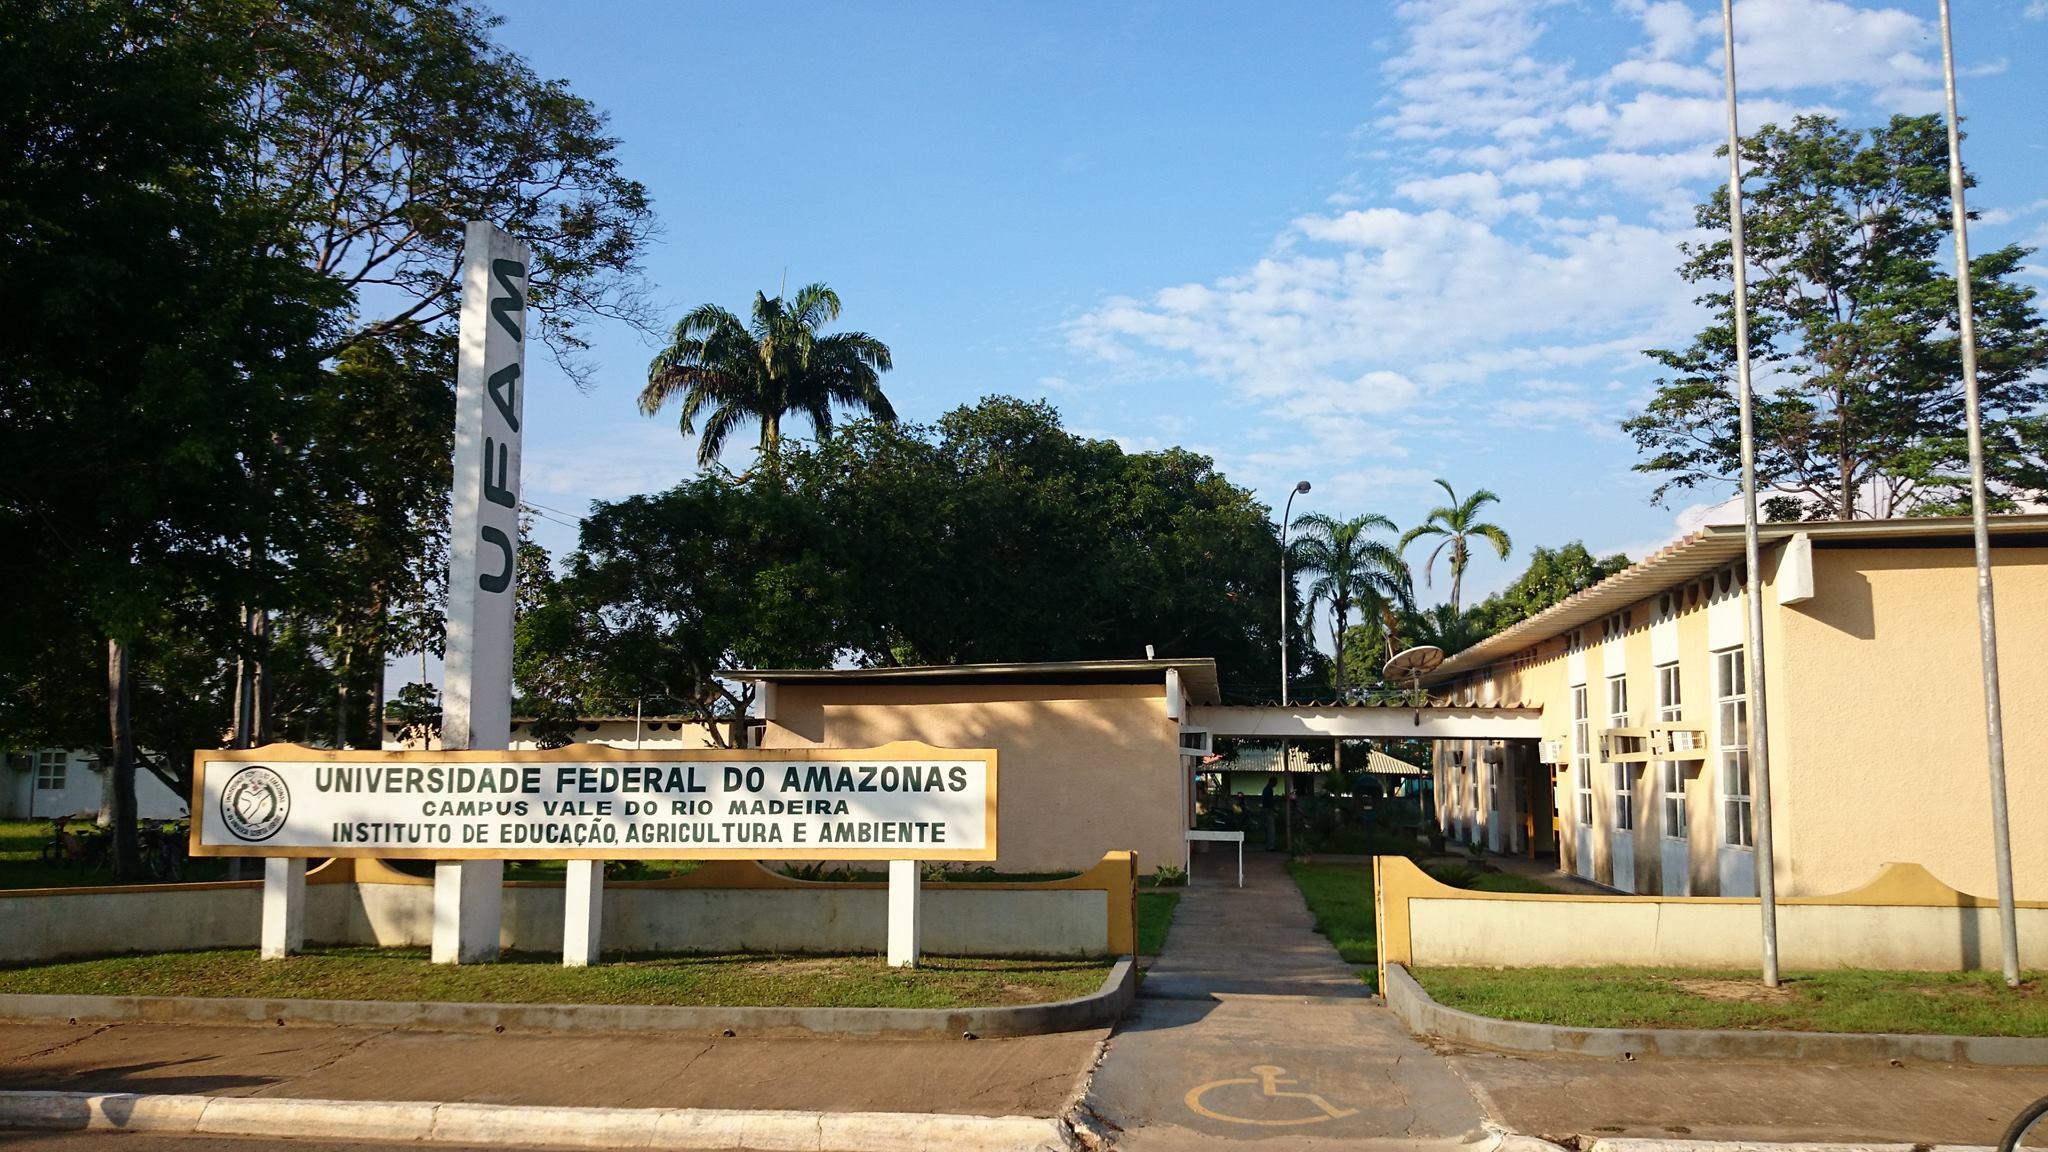 Arquivista do Arquivo Central-UFAM (Campus Manaus) realiza visita técnica ao IEAA-UFAM (Campus Humaitá)